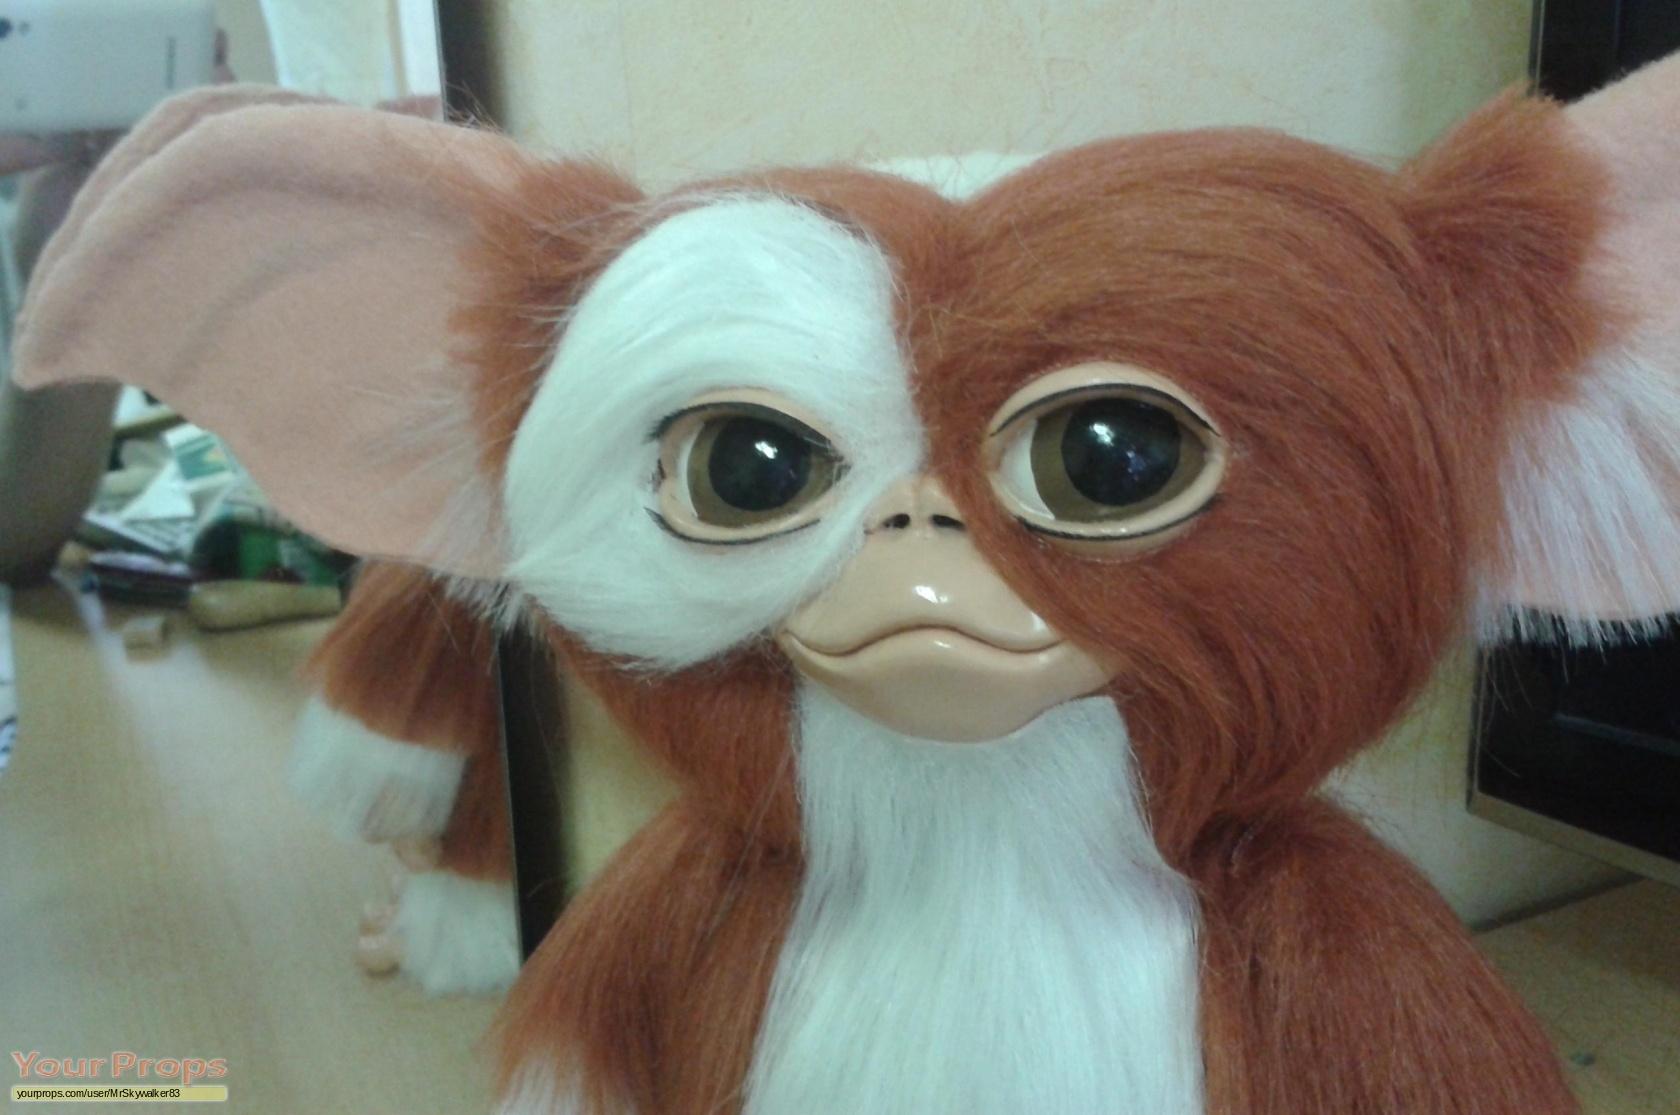 Gremlins 2: The New Batch Gizmo Gremlins replica movie prop